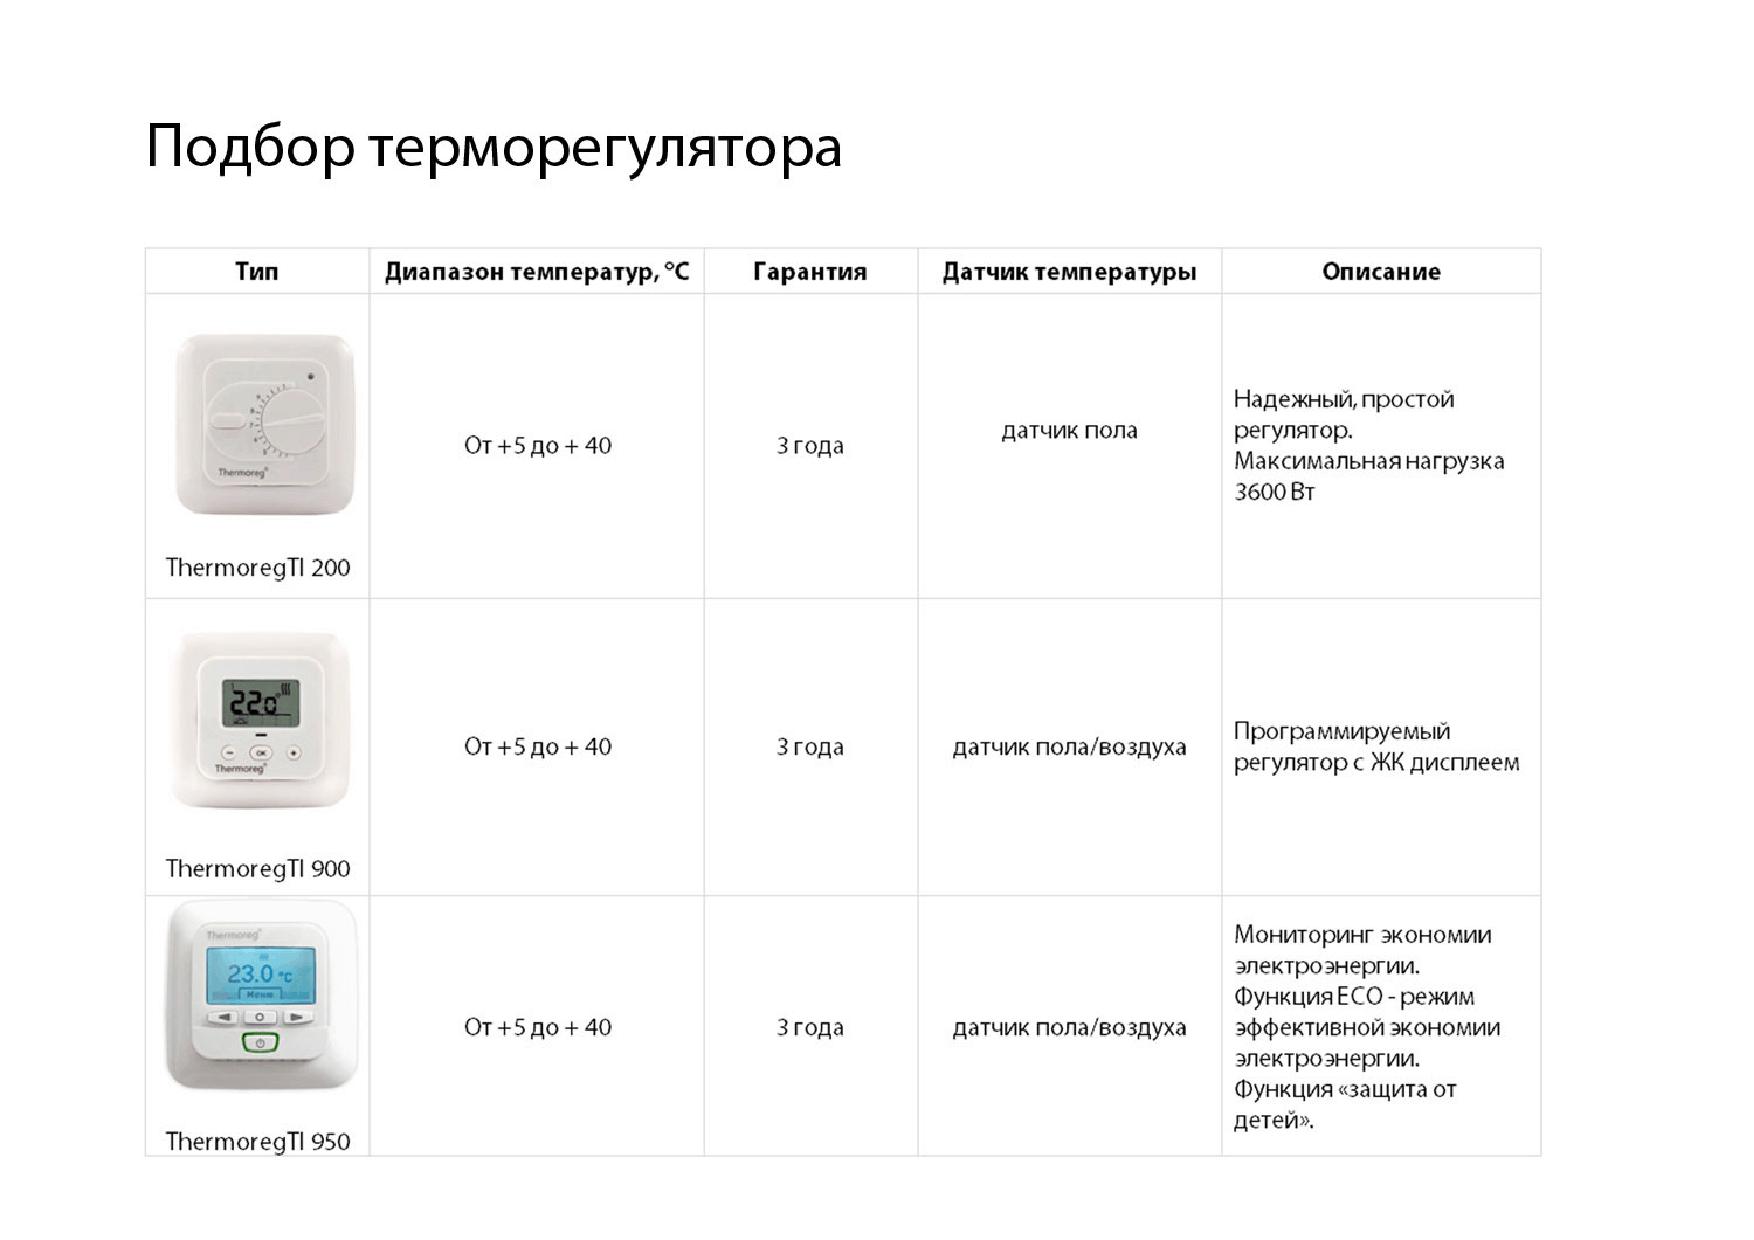 Podbor-termoregulyatora